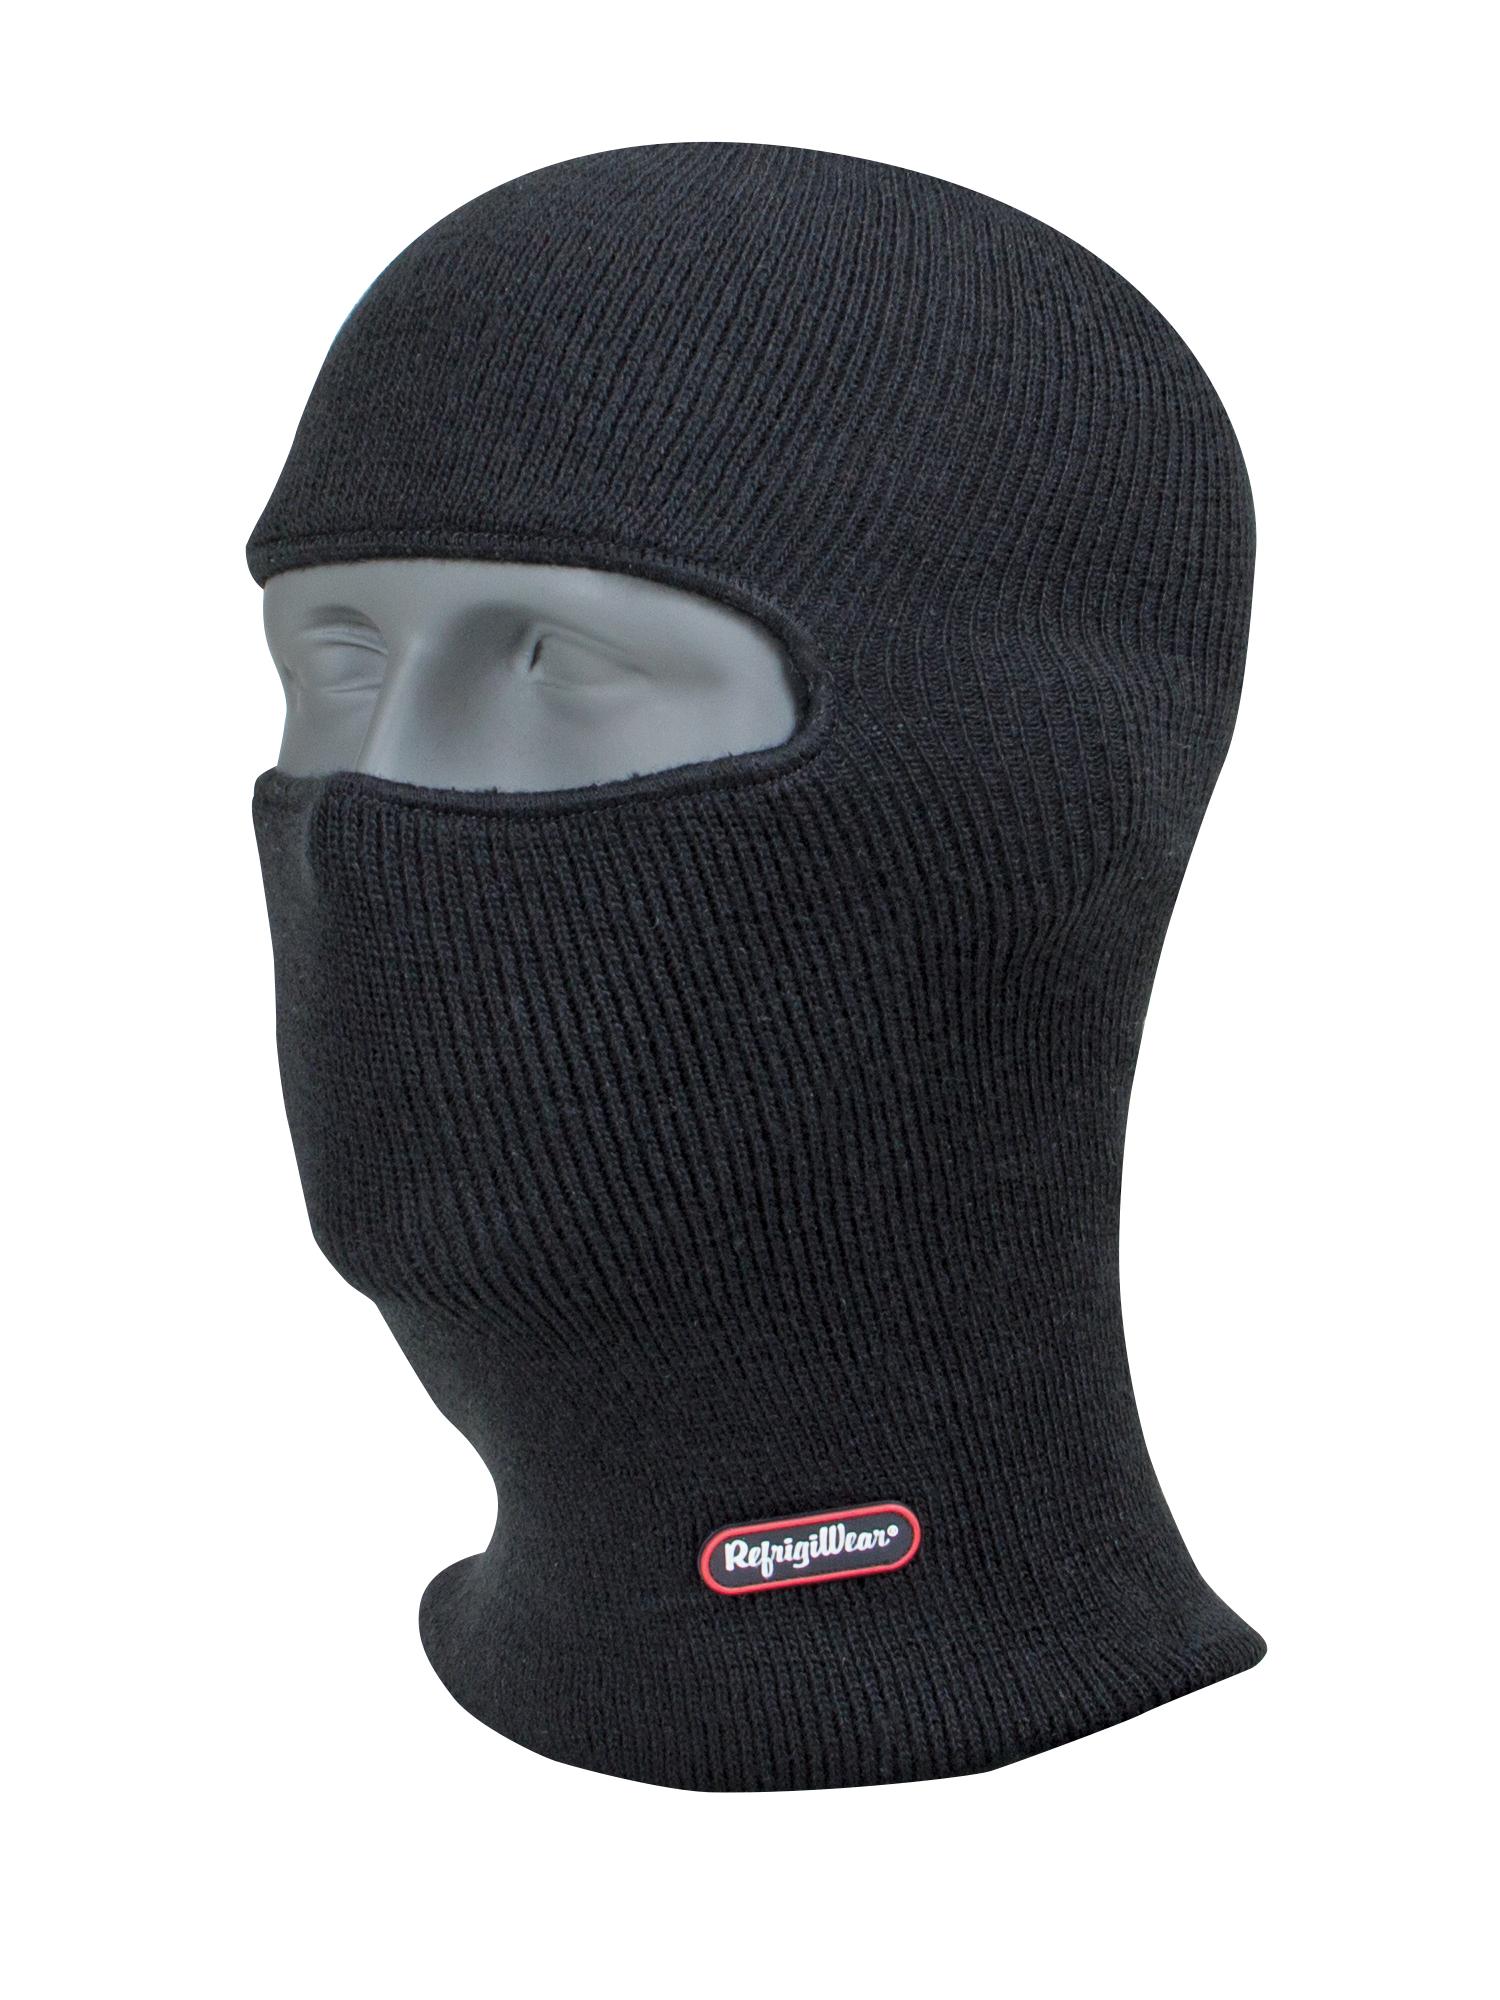 Balaclavas   Face Masks - Shop Cold Weather Thermal Headwear 2185c7022f